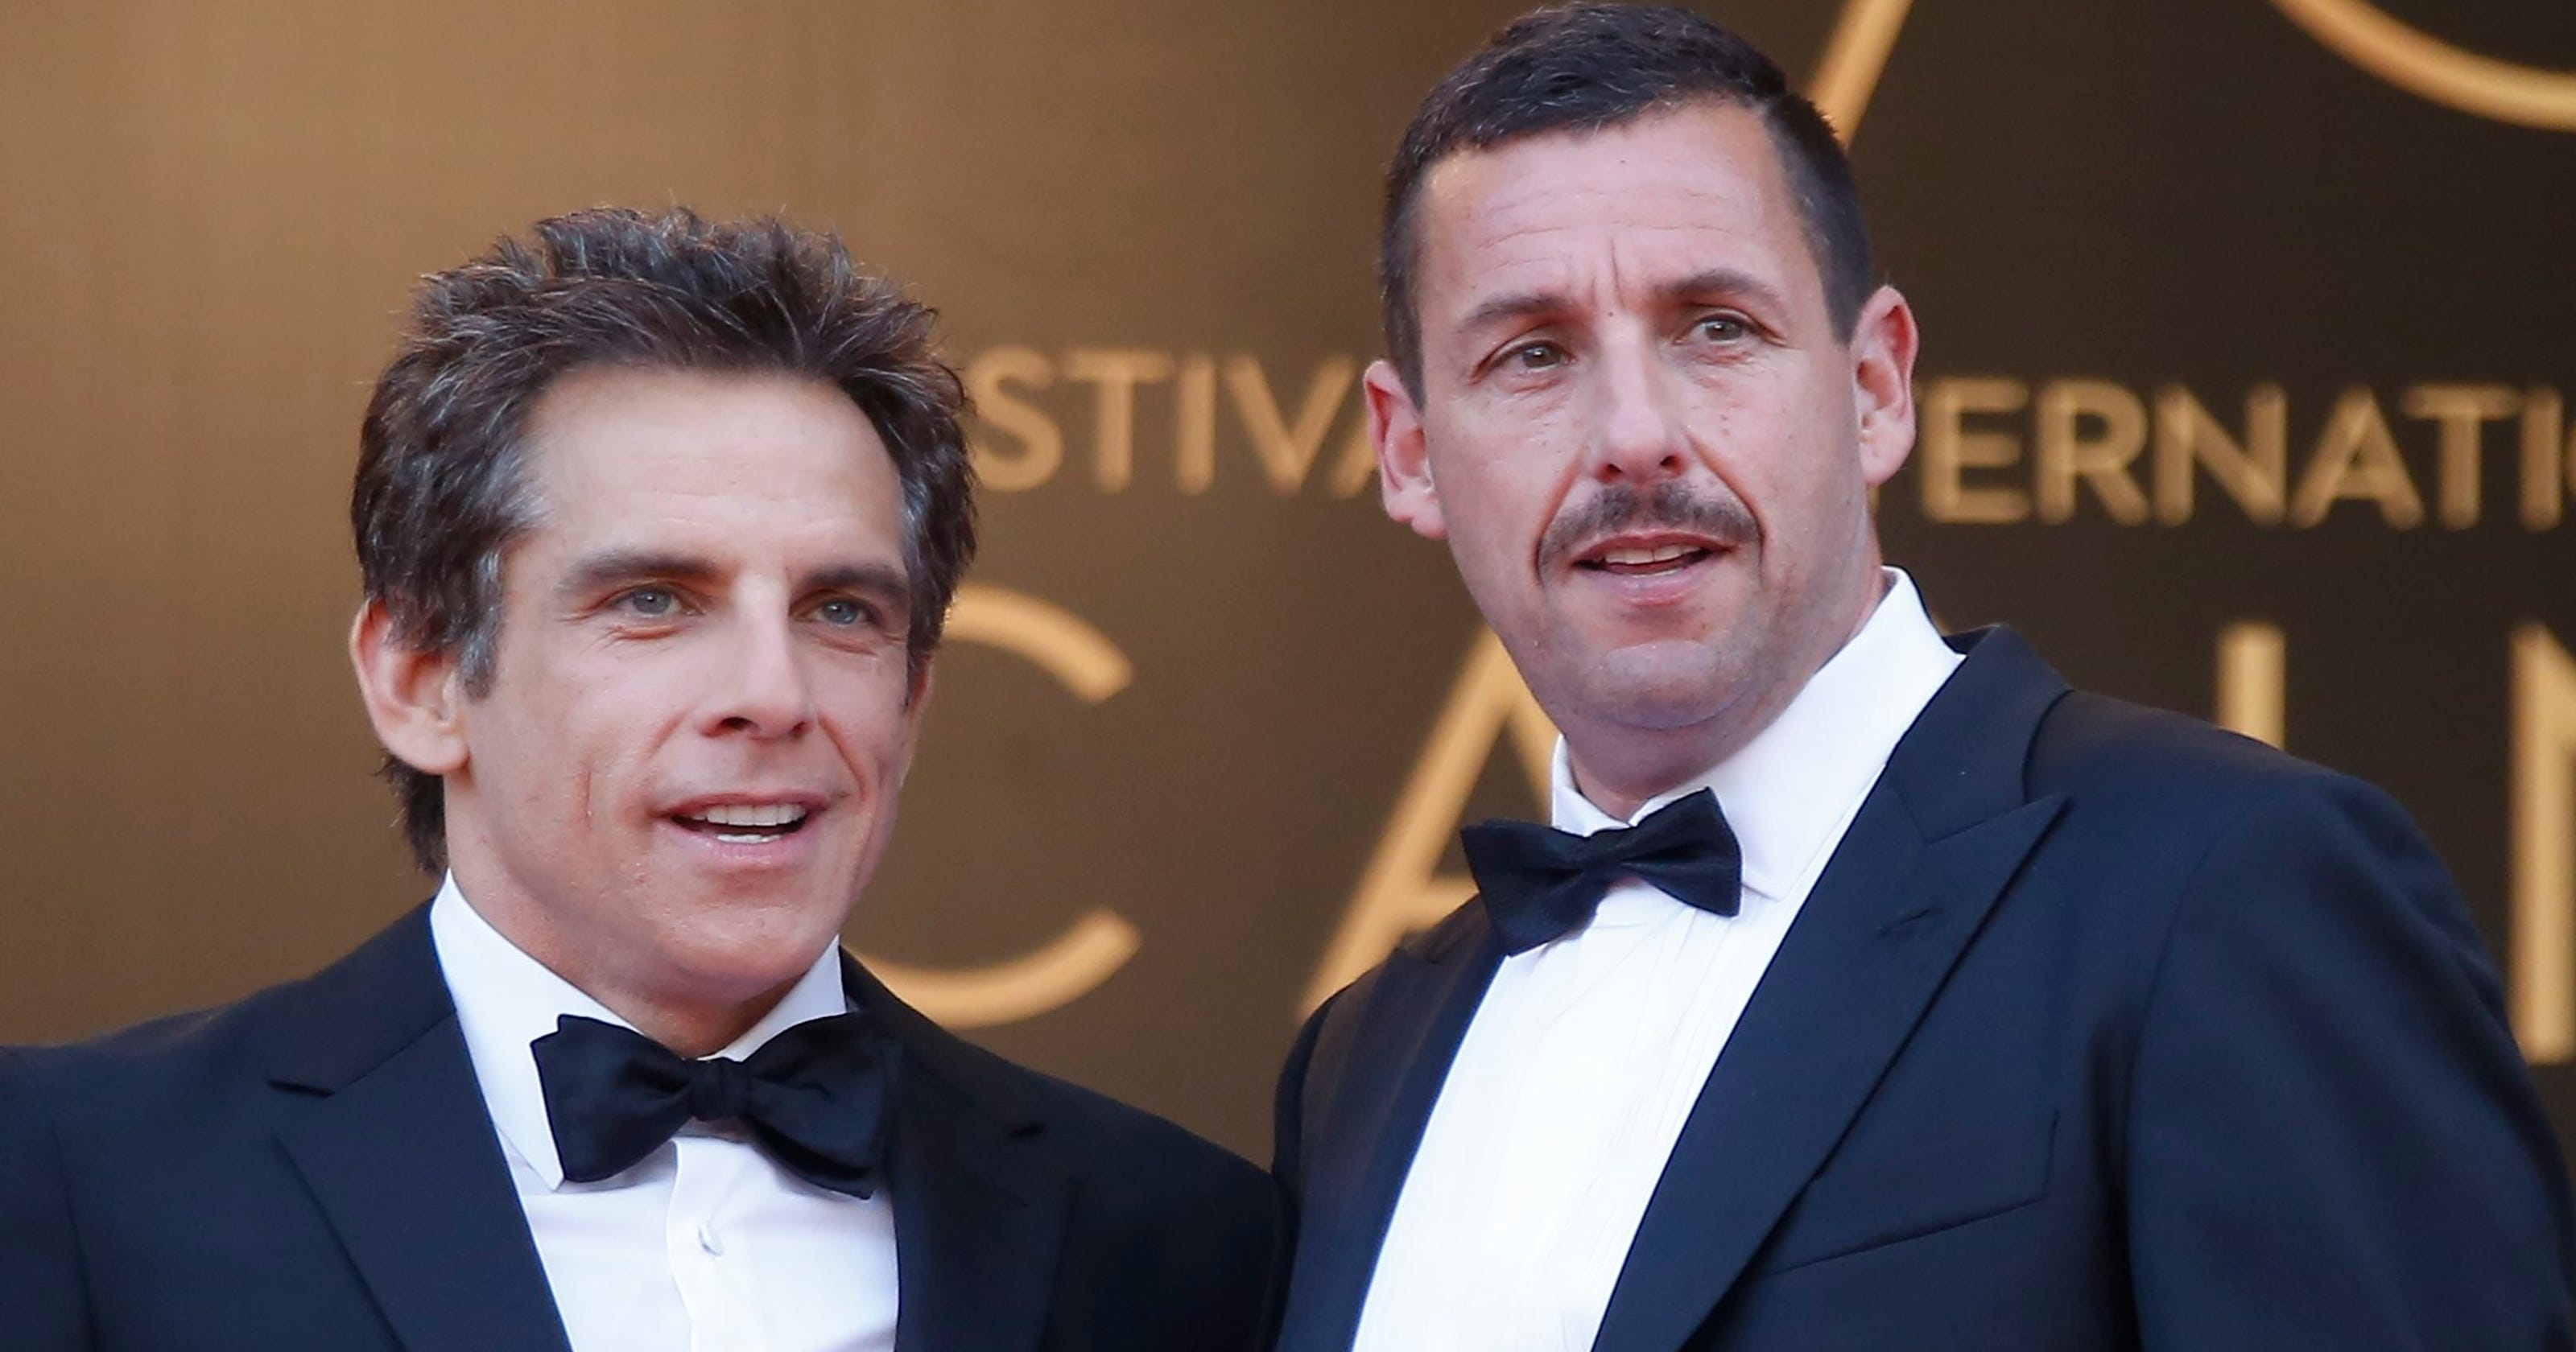 d0790983012 Adam Sandler and Ben Stiller say fans confuse them  a few times a week